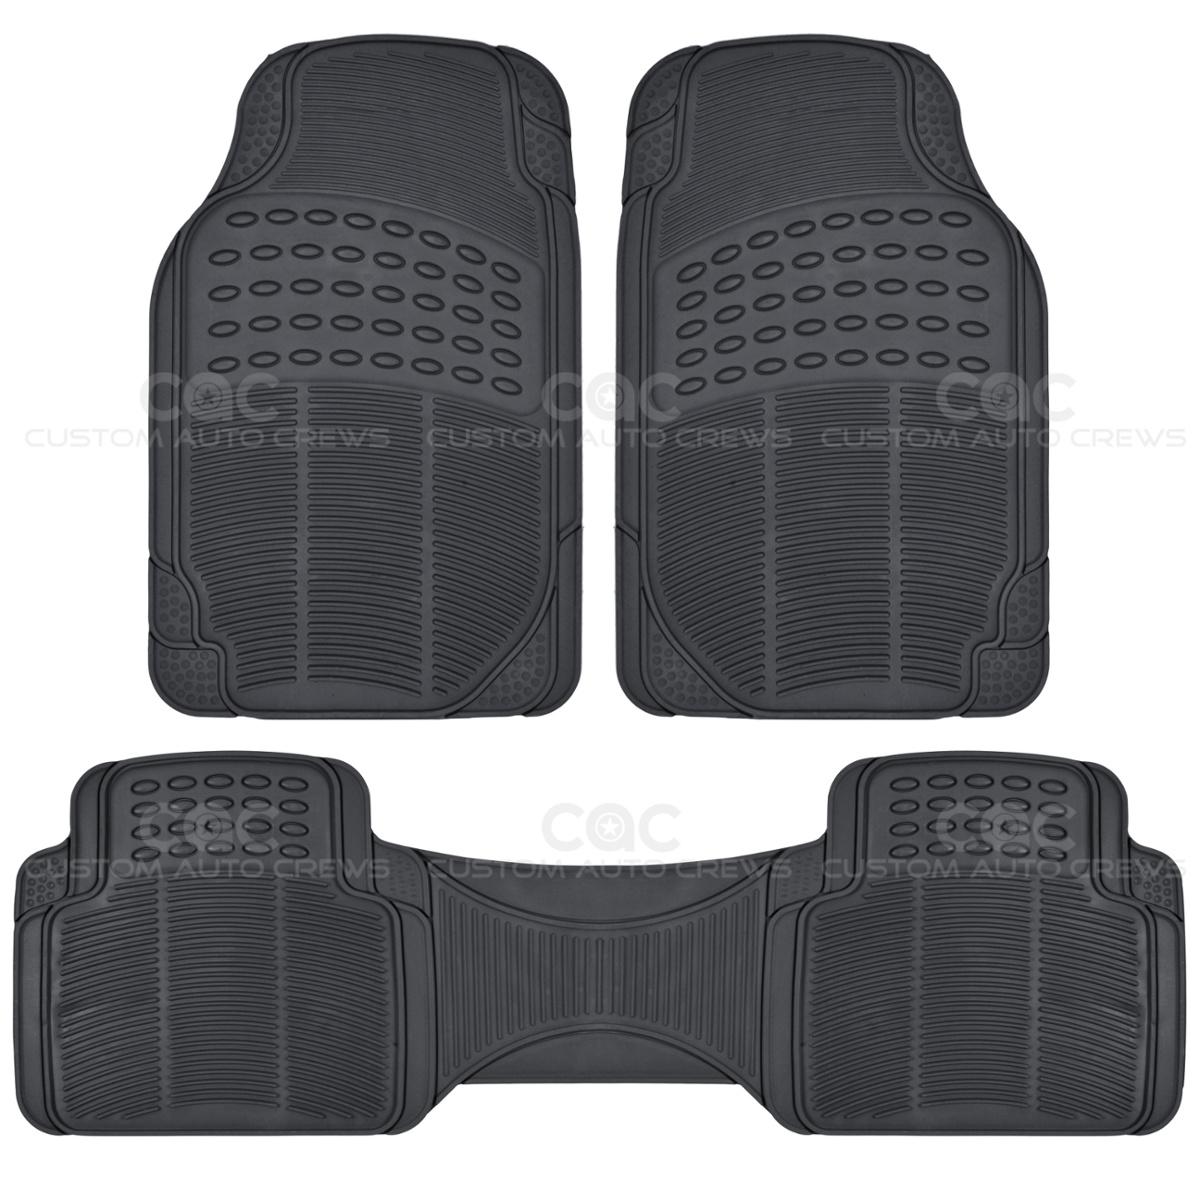 Rubber floor mats for lincoln mkx - Black All Weather Rubber Floor Mats Liner Set Interior Durable Bdk